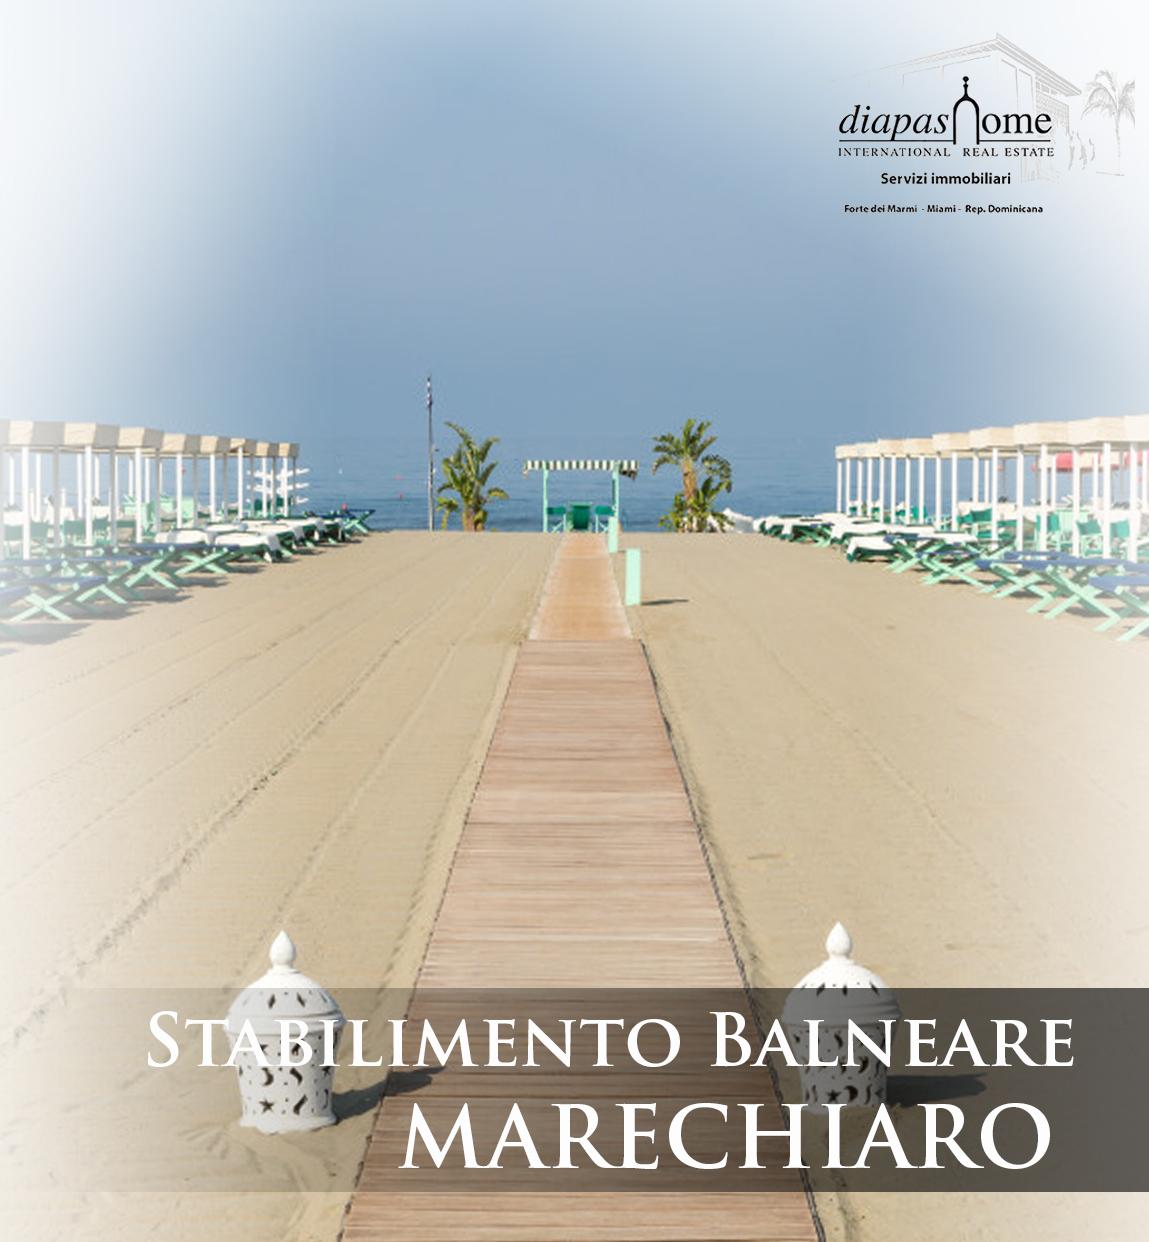 Bagno marechiaro forte dei marmi italia diapashome - Bagno piemonte forte dei marmi ...